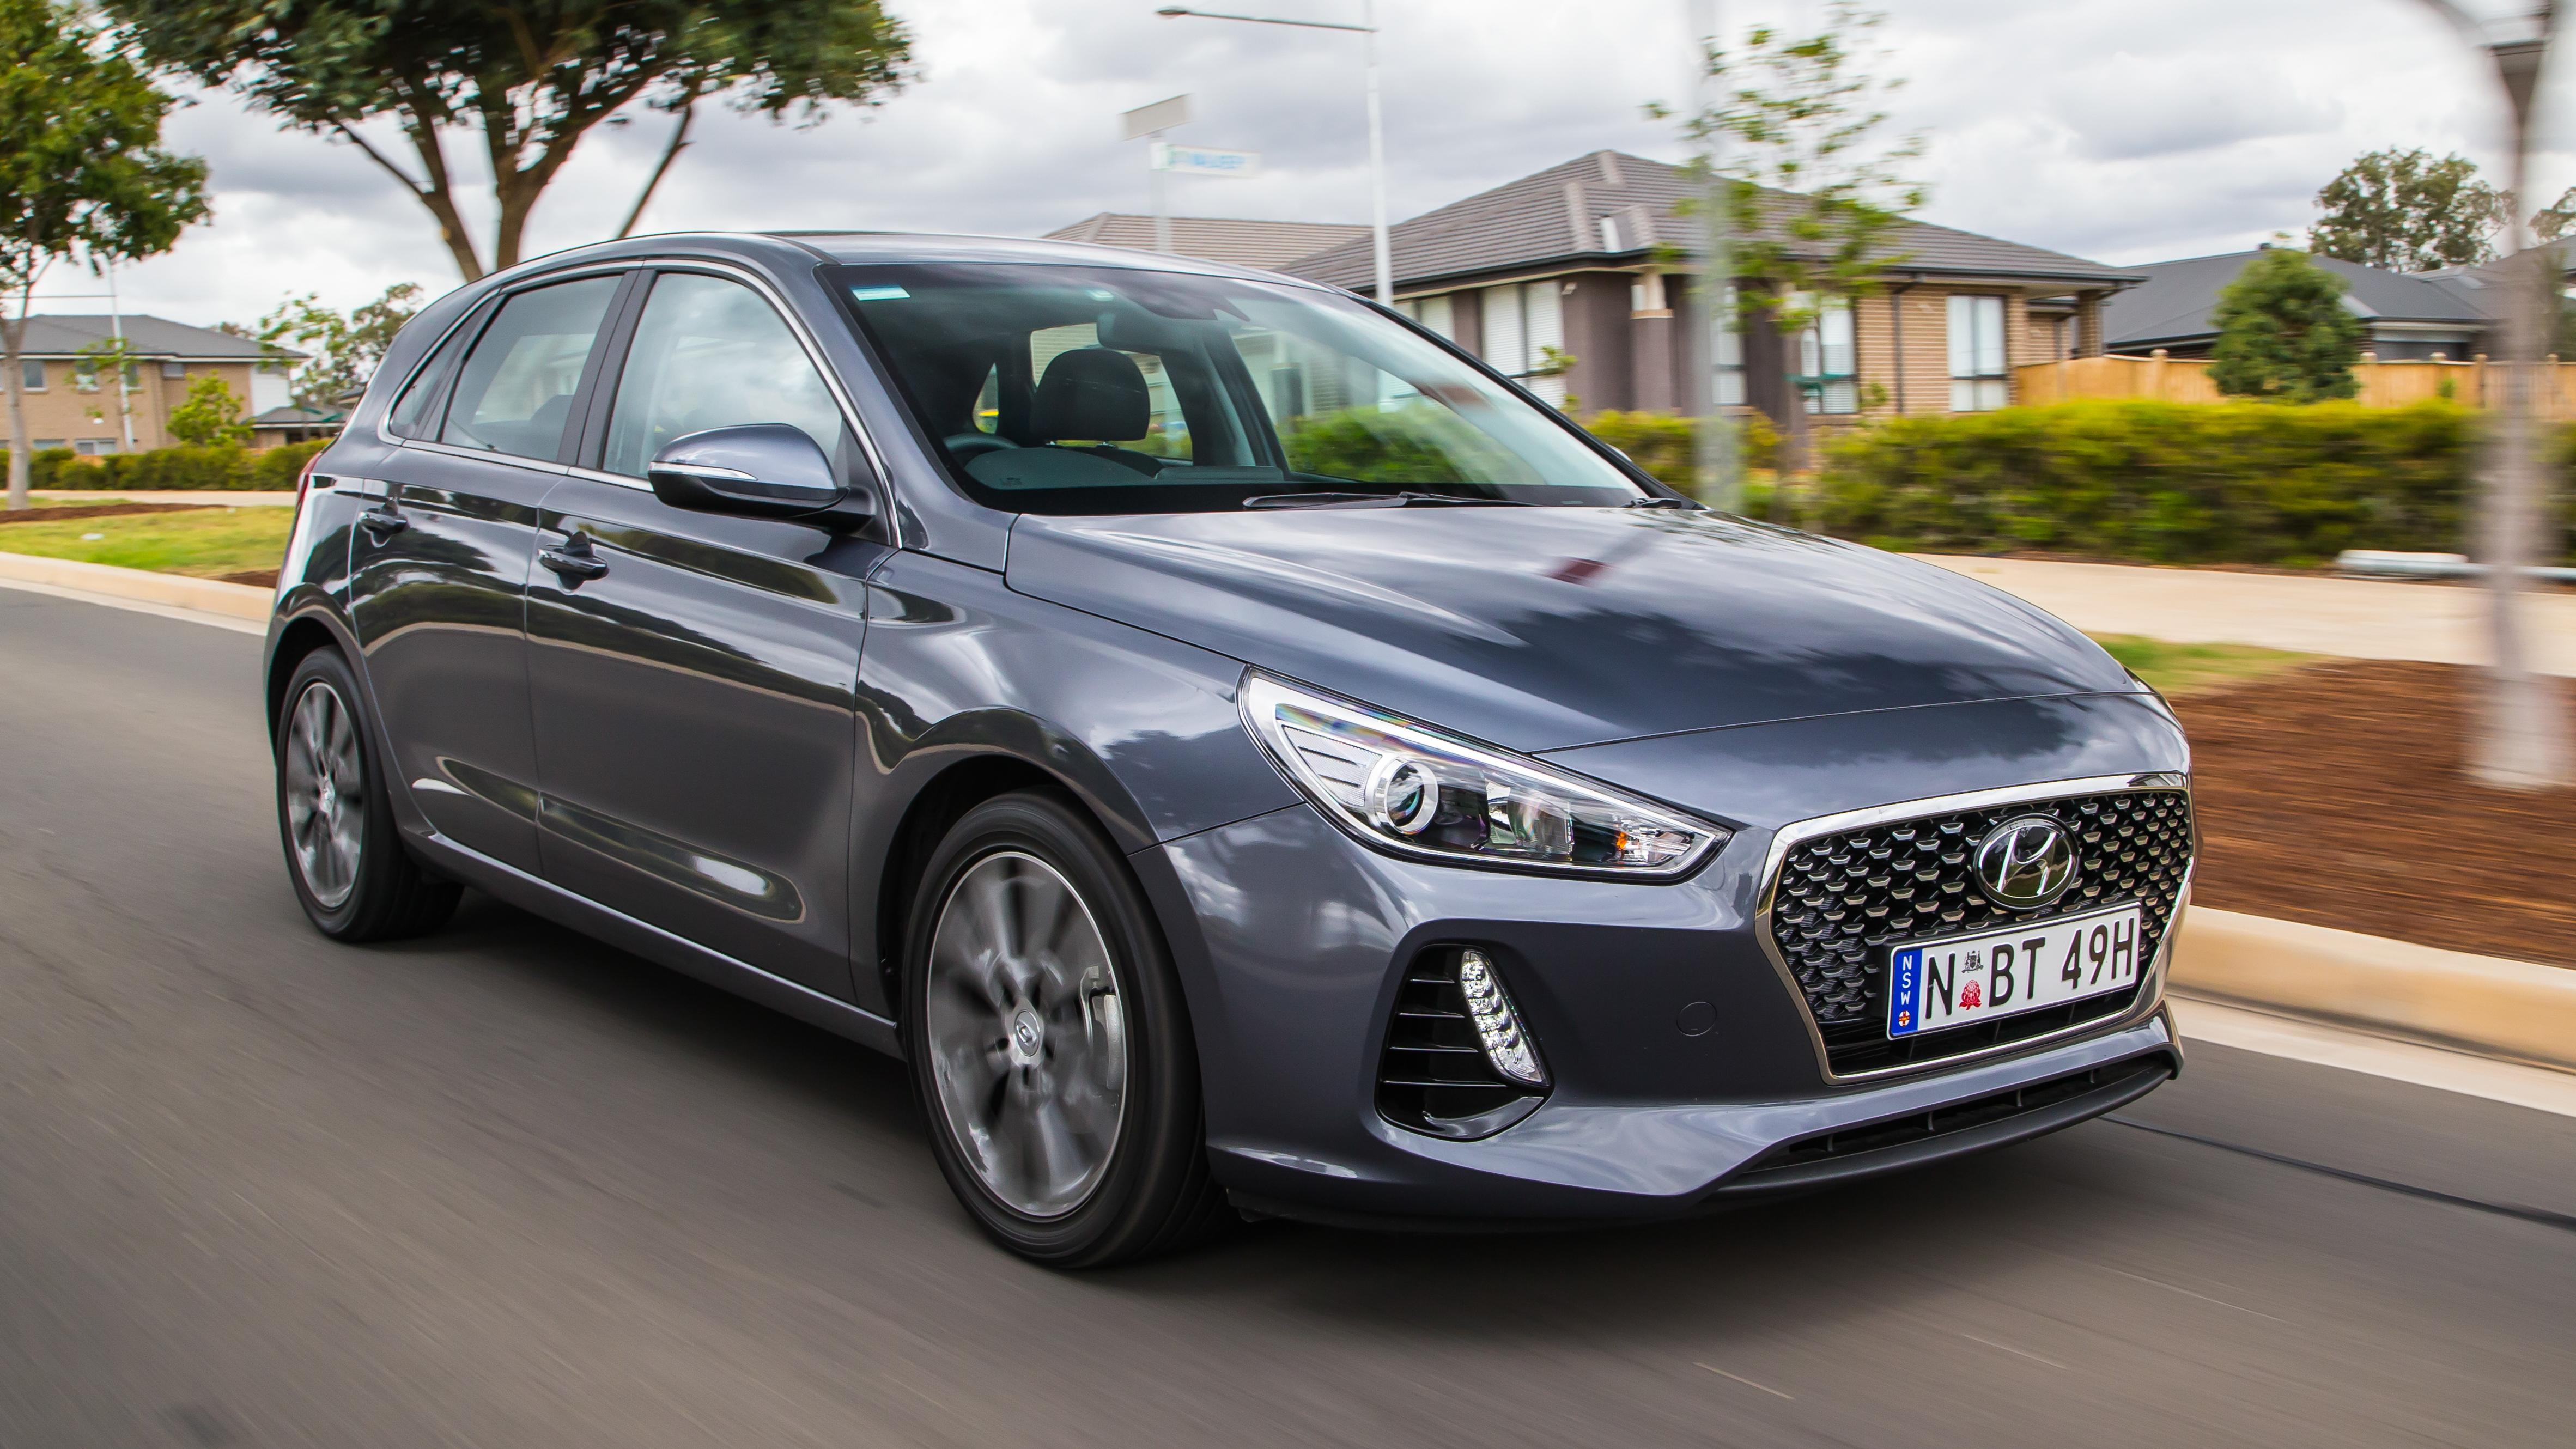 Hyundai i30 tracking